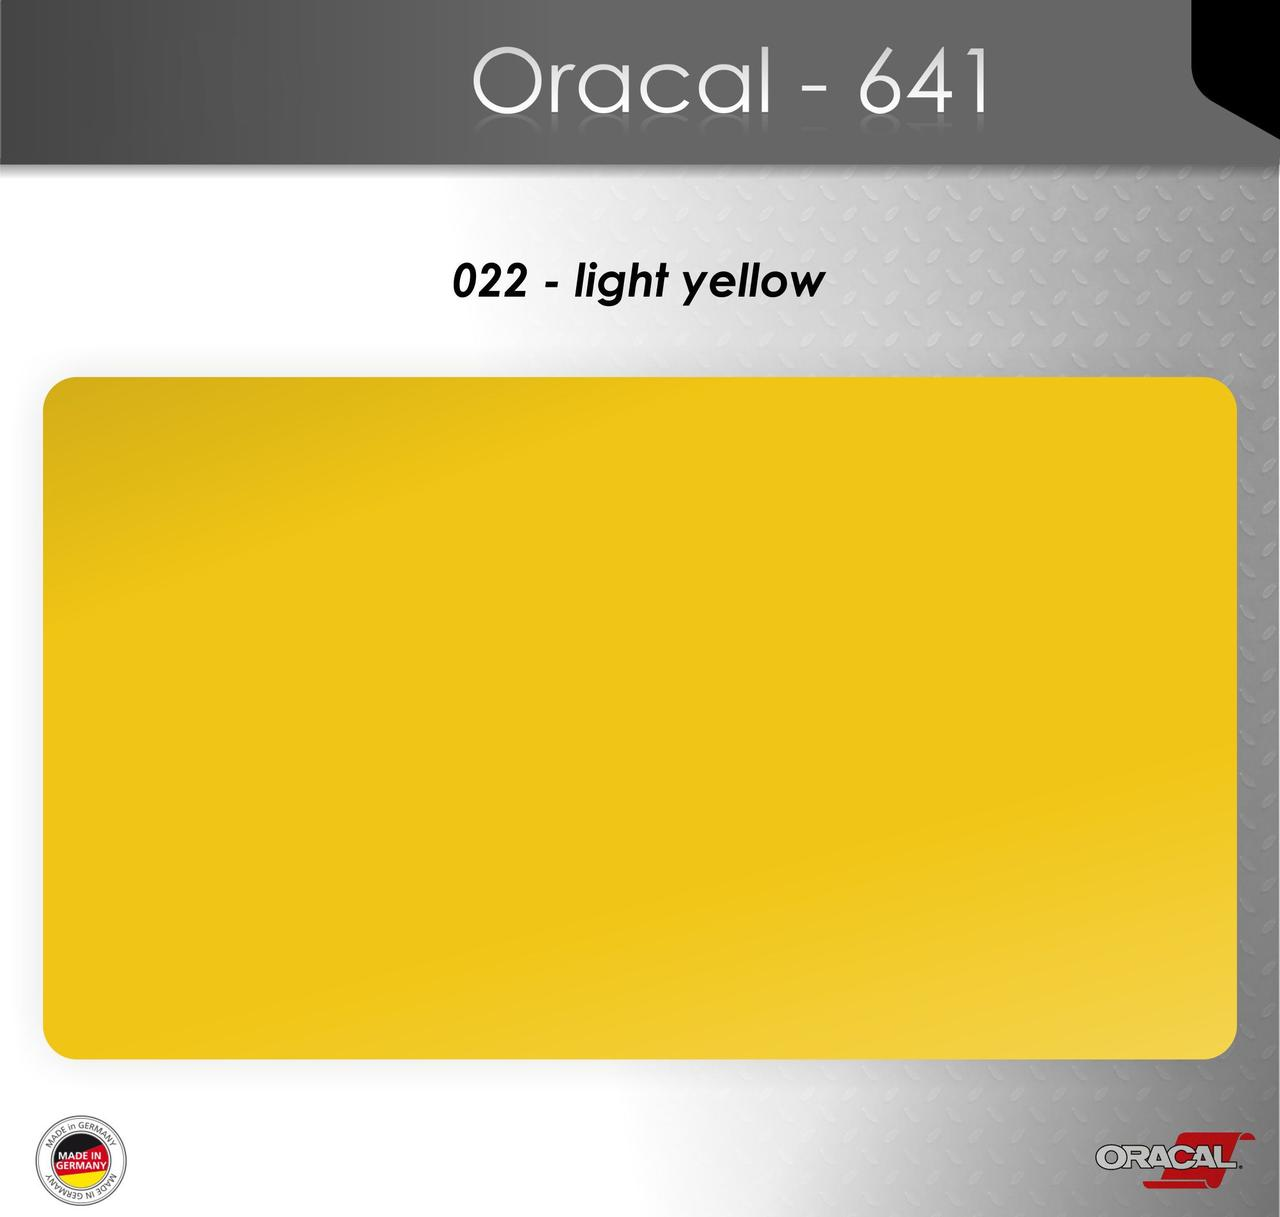 Пленка Оракал 641/светло-желтый (022)